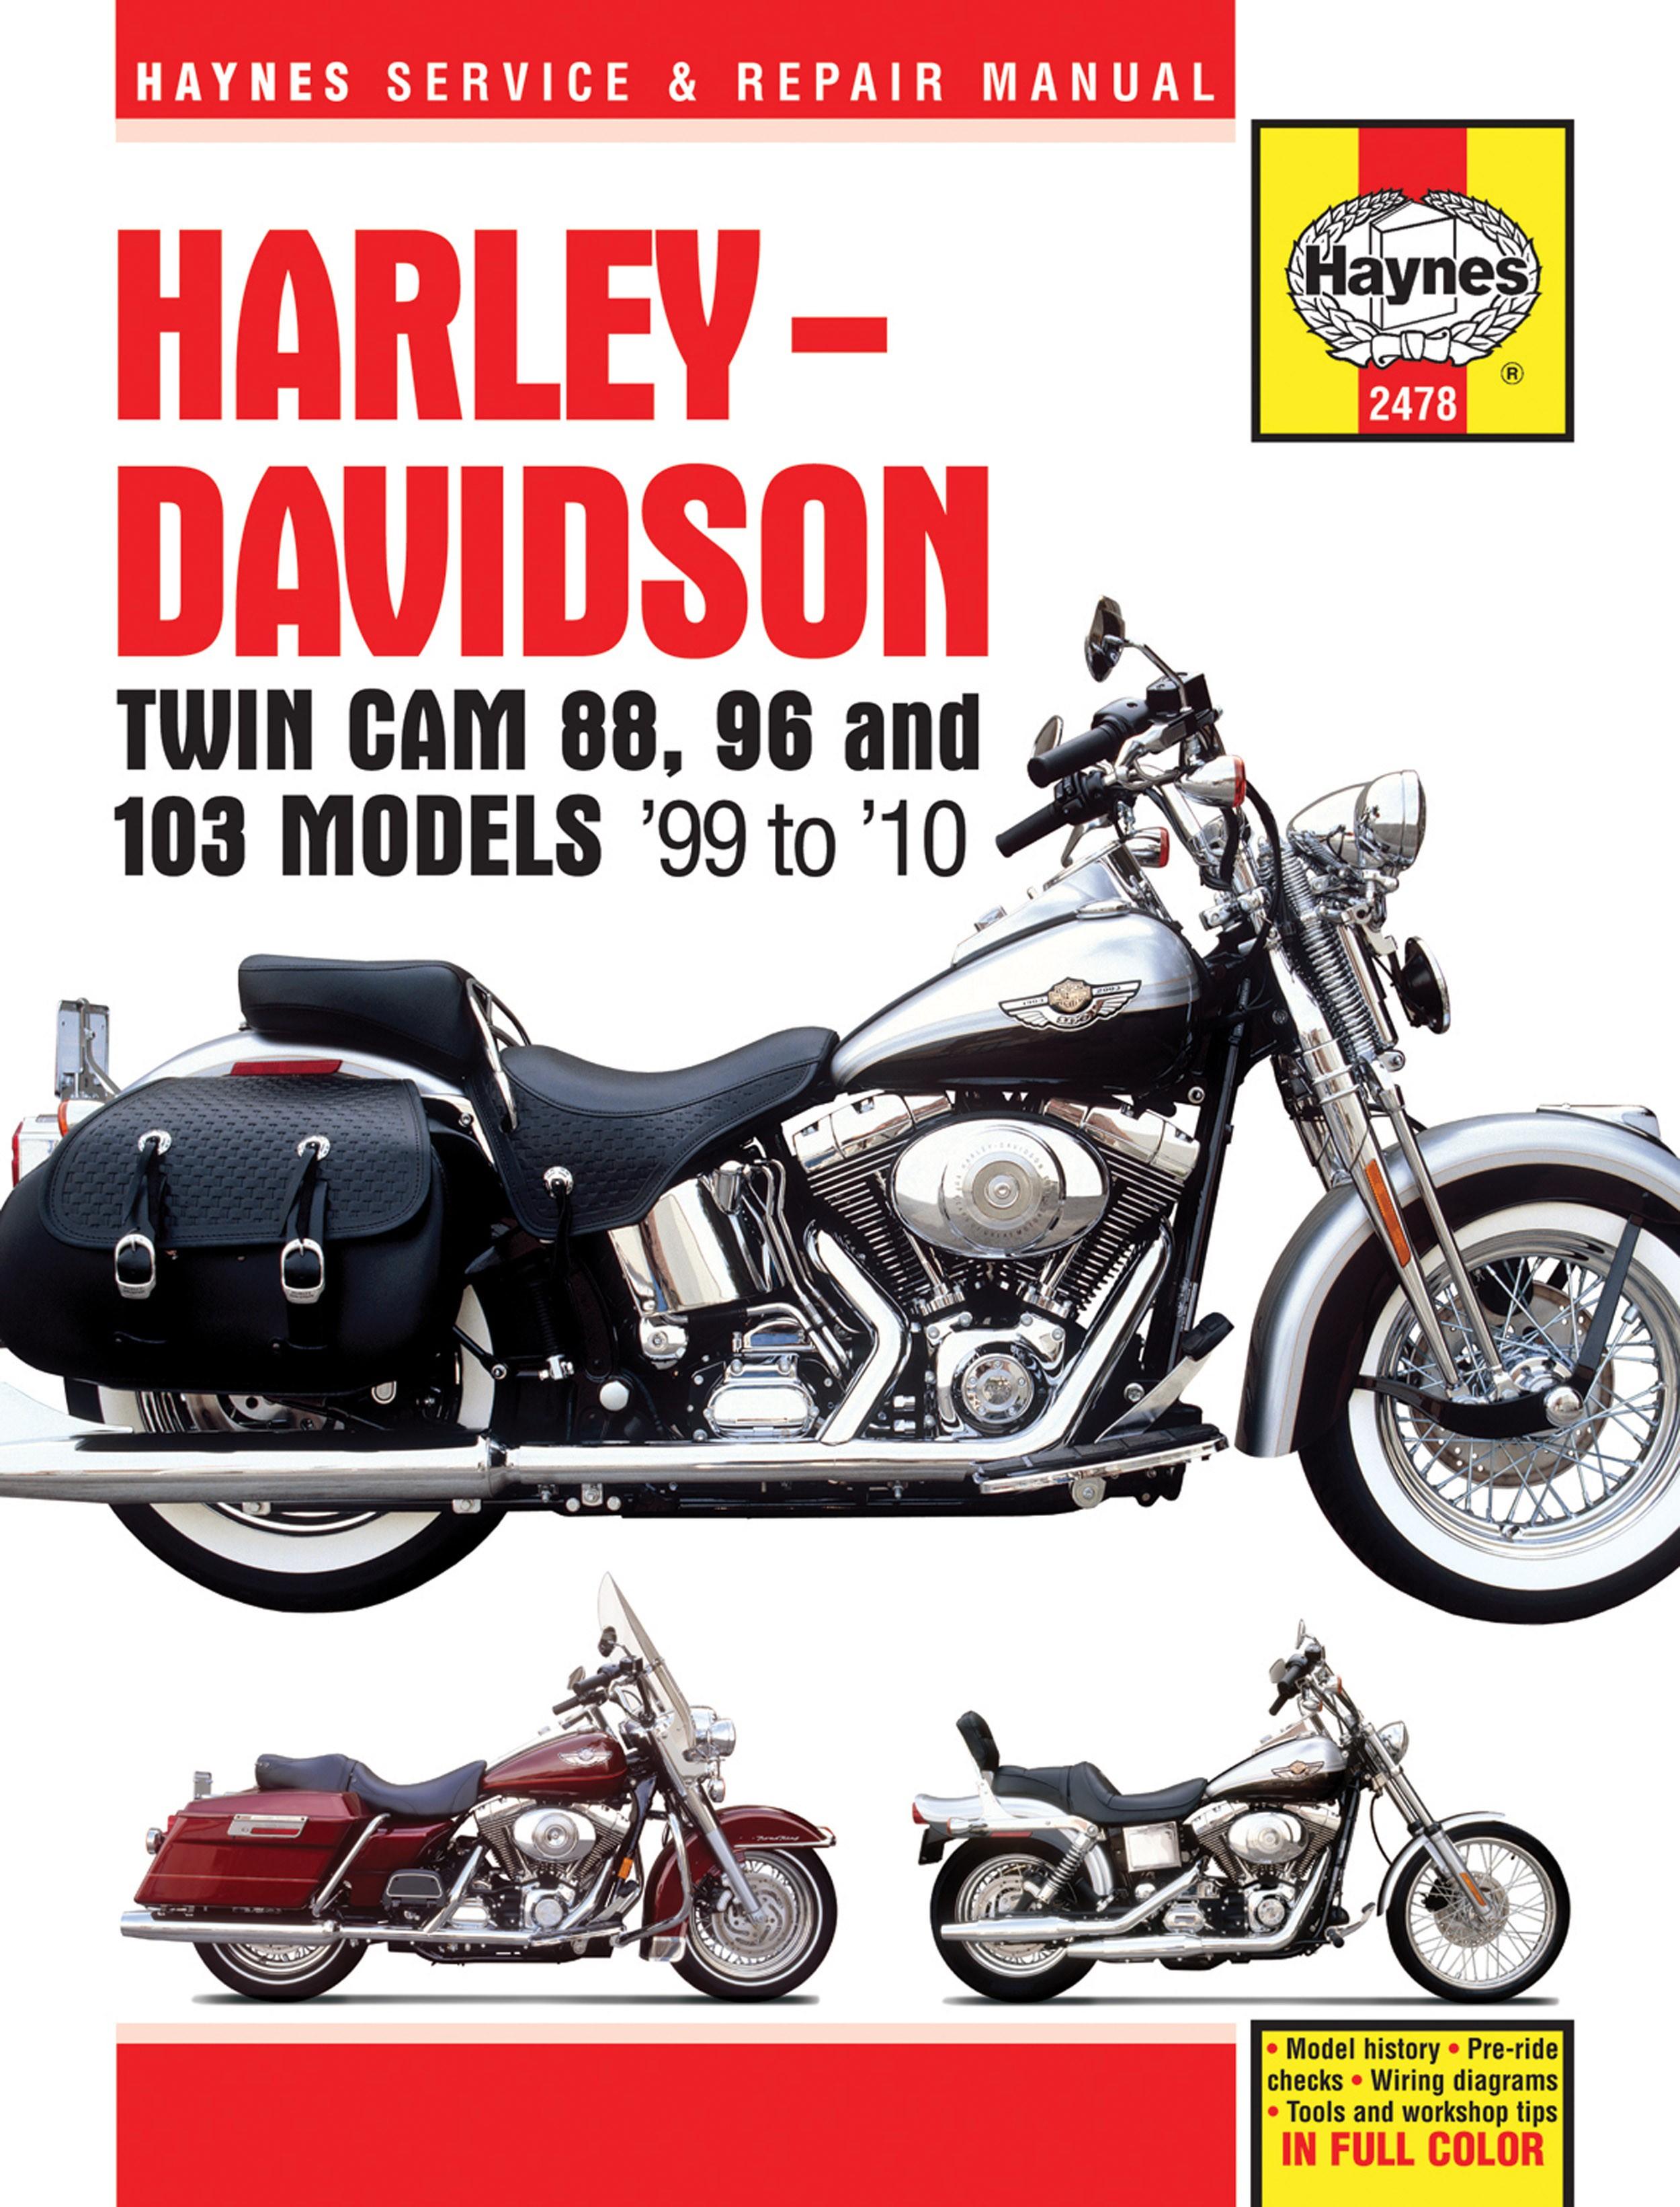 99 Harley Softail Wiring Diagram Free Wiring Diagram For You \u2022 Harley  Davidson 103 Engine Diagram Harley Davidson 103 Engine Diagram